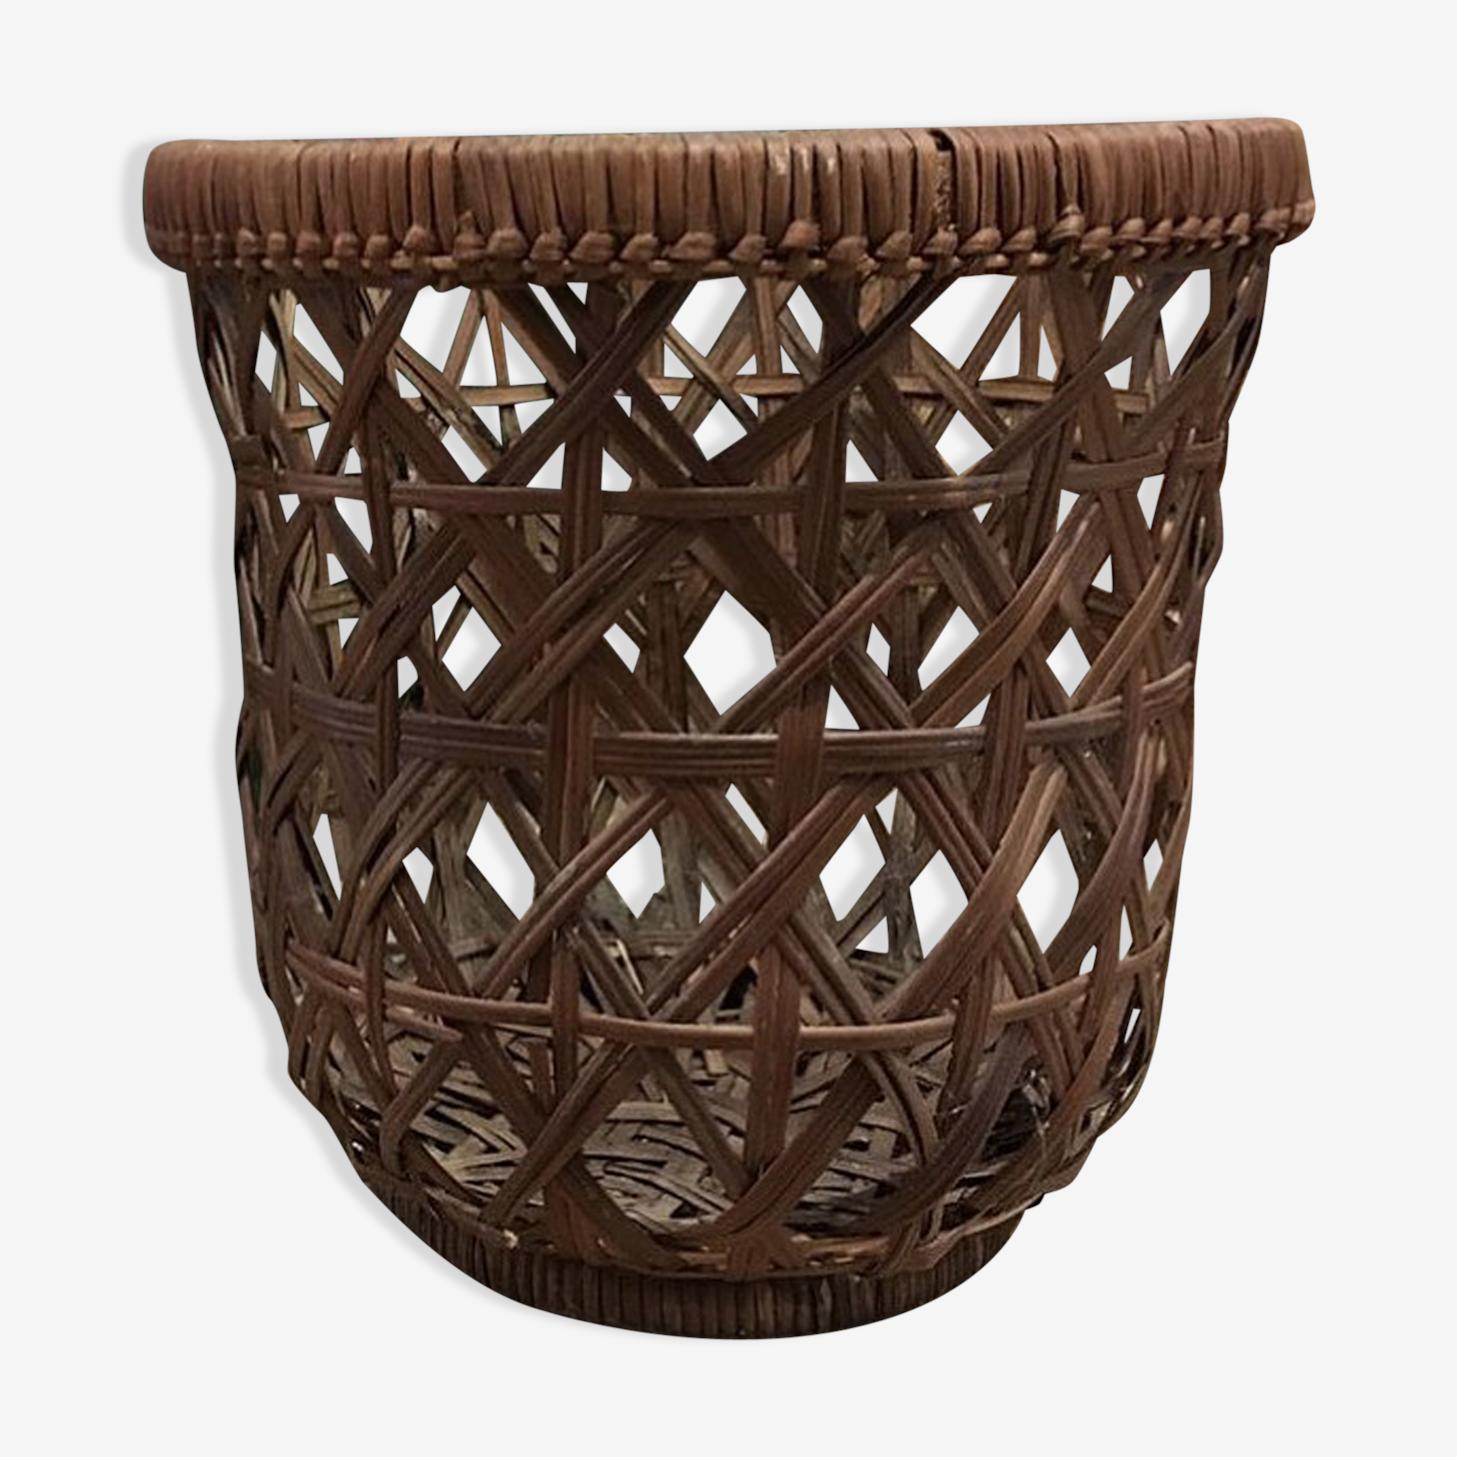 Vintage braided wicker basket